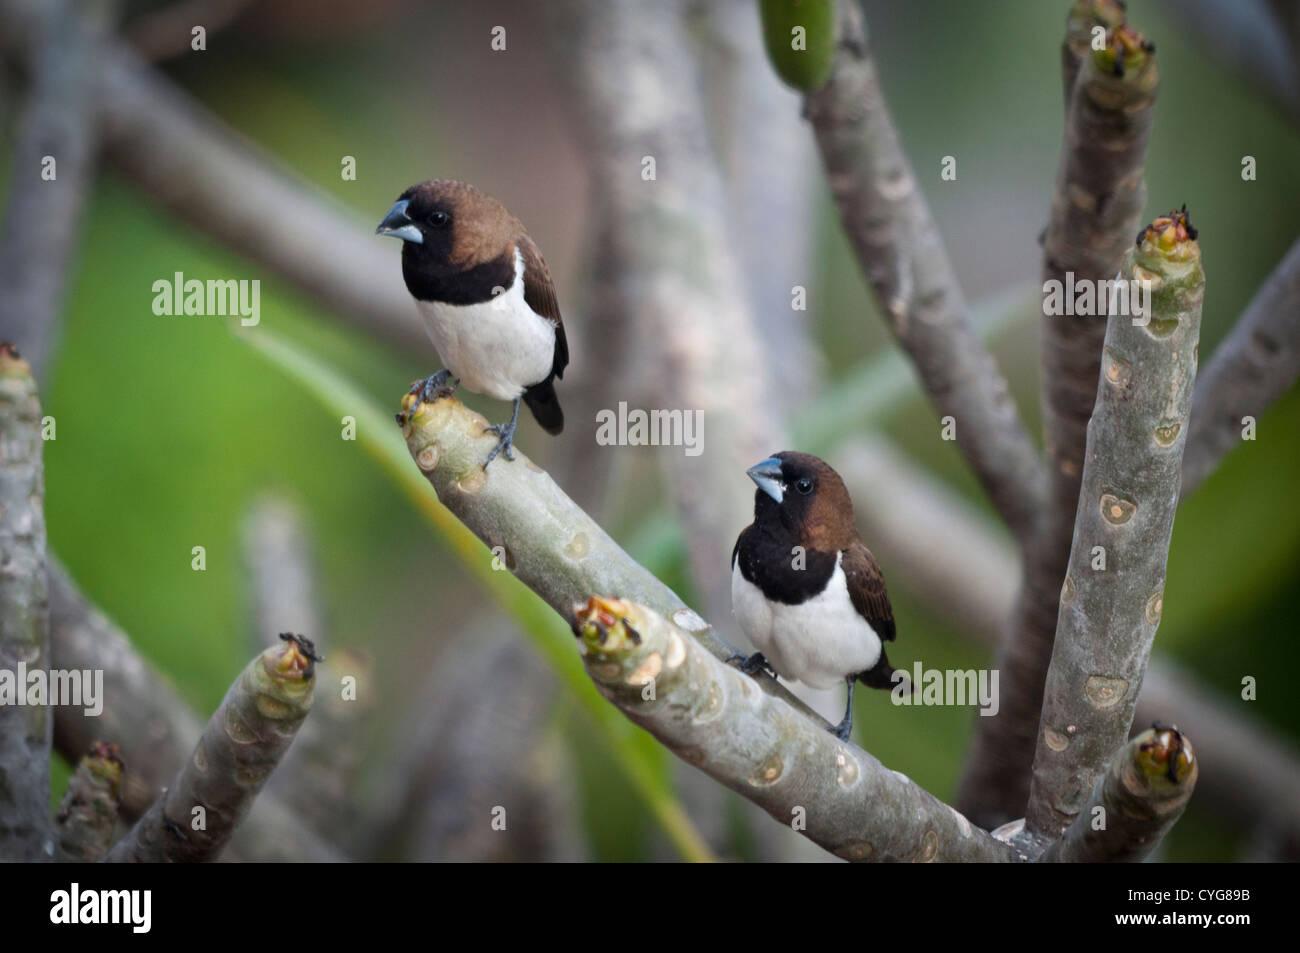 Javan Munia (Lonchura leucogastroides) - Stock Image